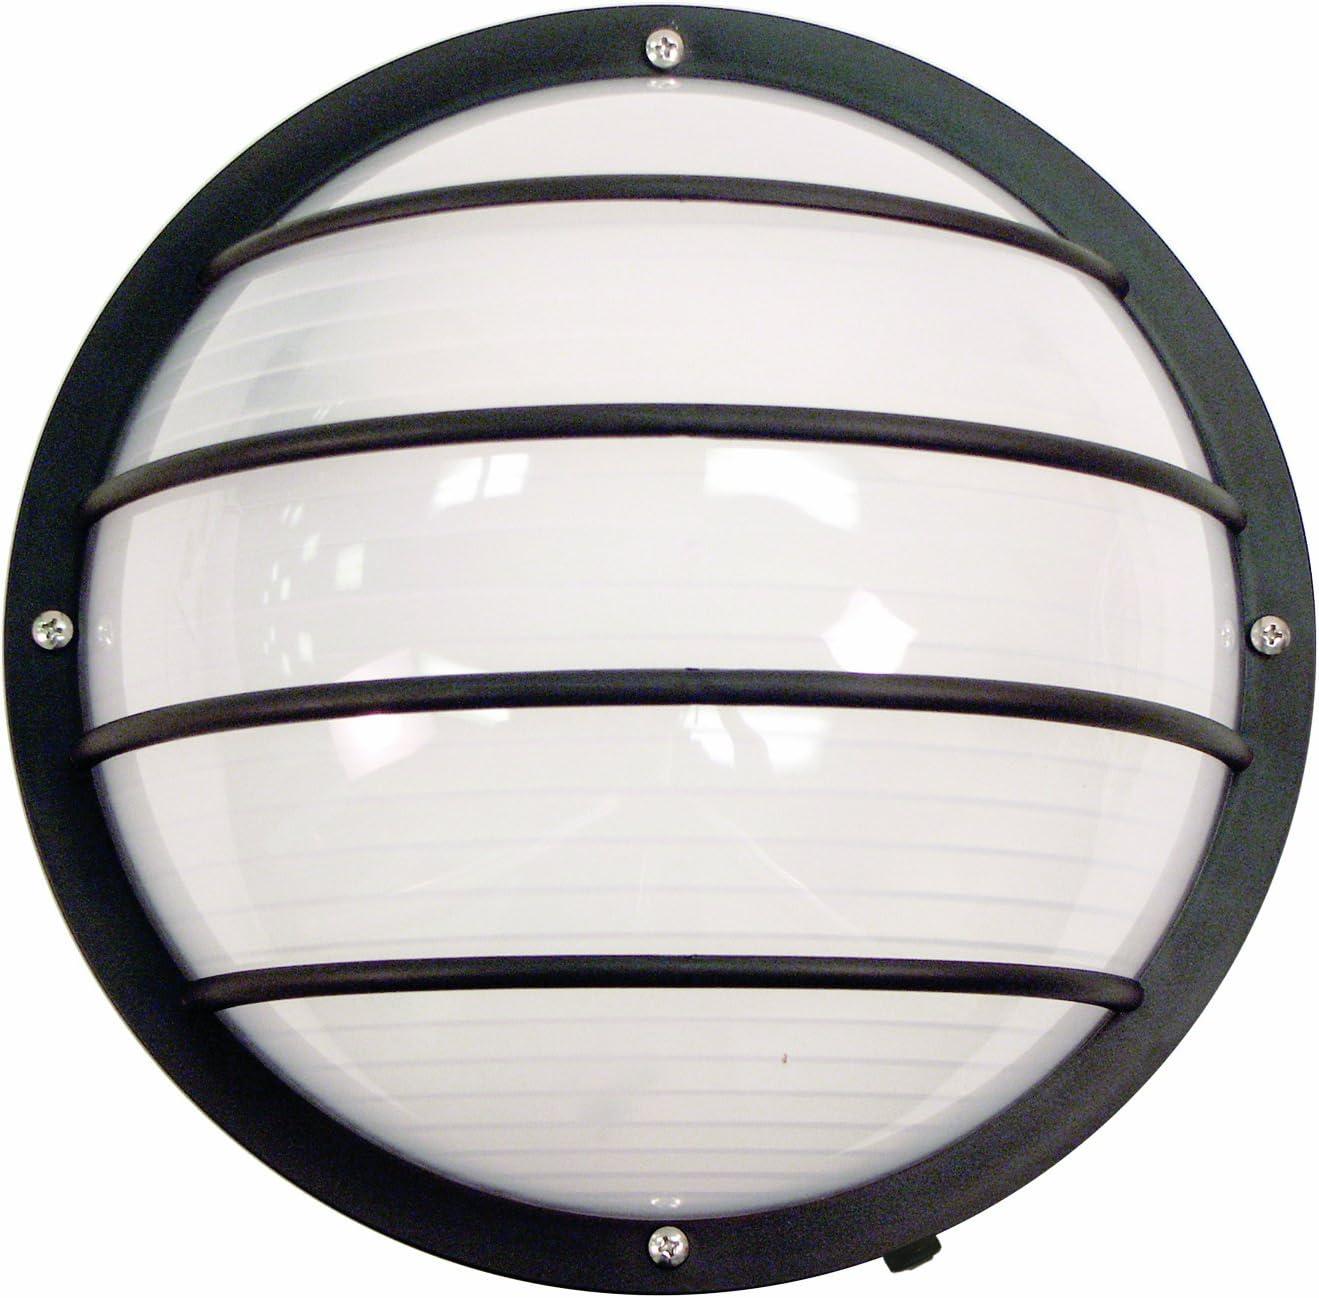 Sunlite 49004-SU LFX/DOD/EL/BK/FR/40K Decorative Outdoor LED Eurostyle Linear Polycarbonate Fixture, Black Finish, Frosted Lens